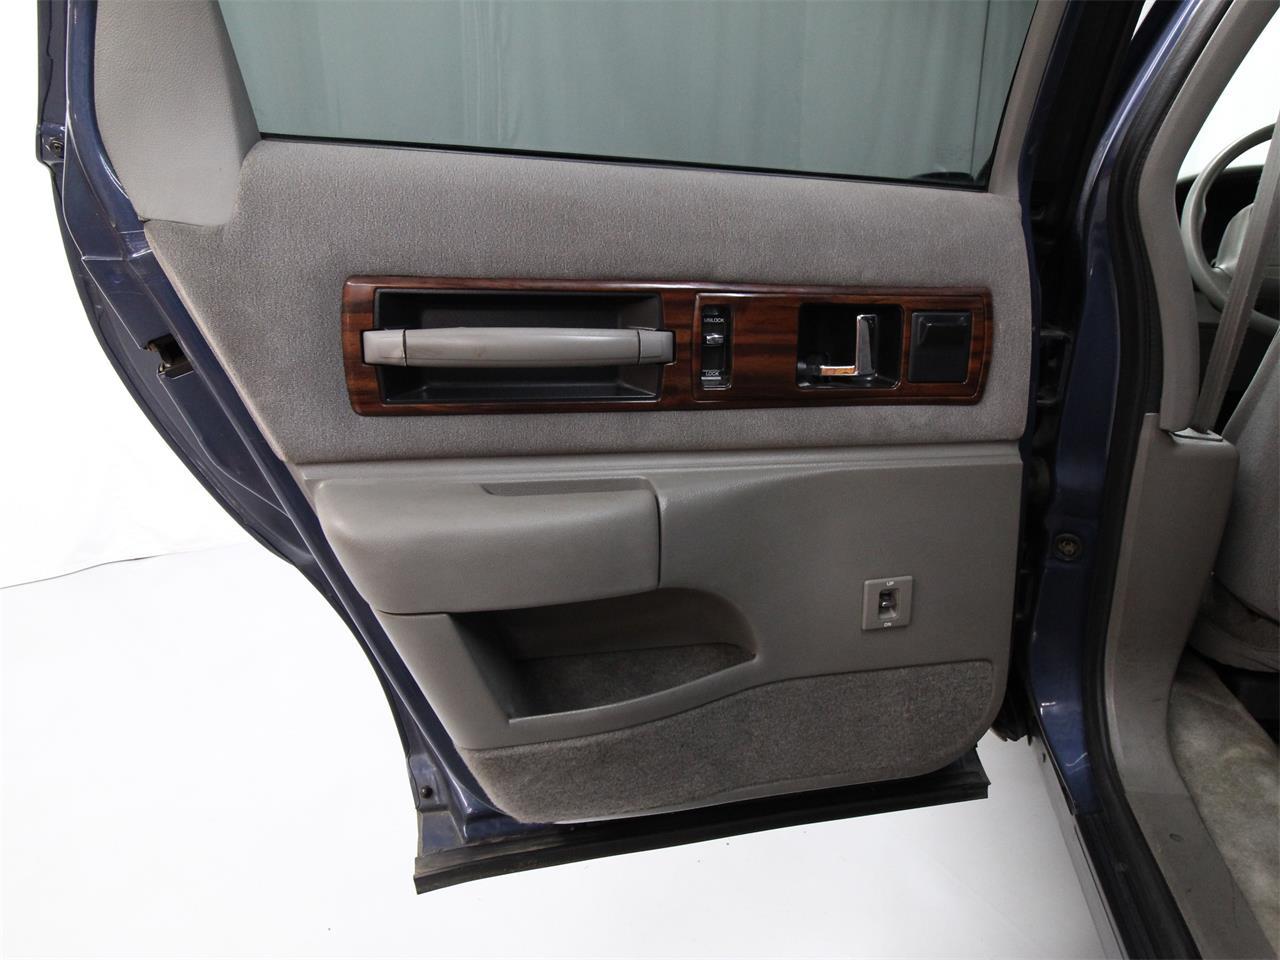 1994 Chevrolet Caprice (CC-1236476) for sale in Christiansburg, Virginia